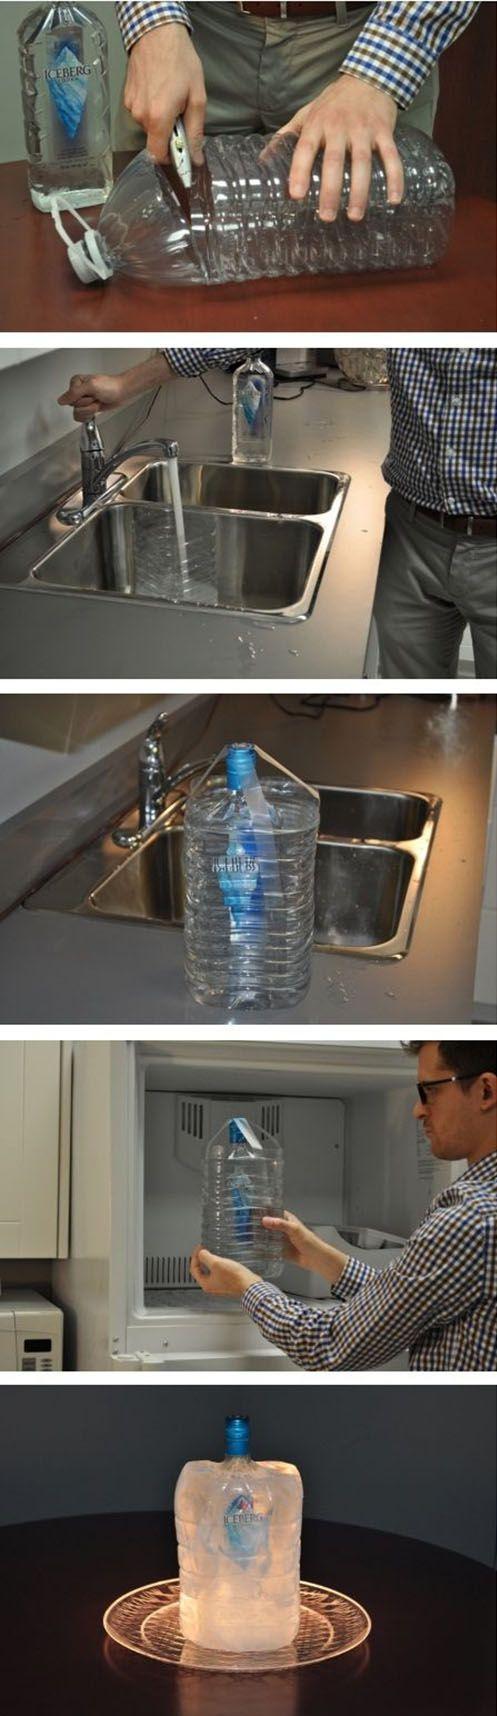 Great Idea | DIY & Crafts Tutorials